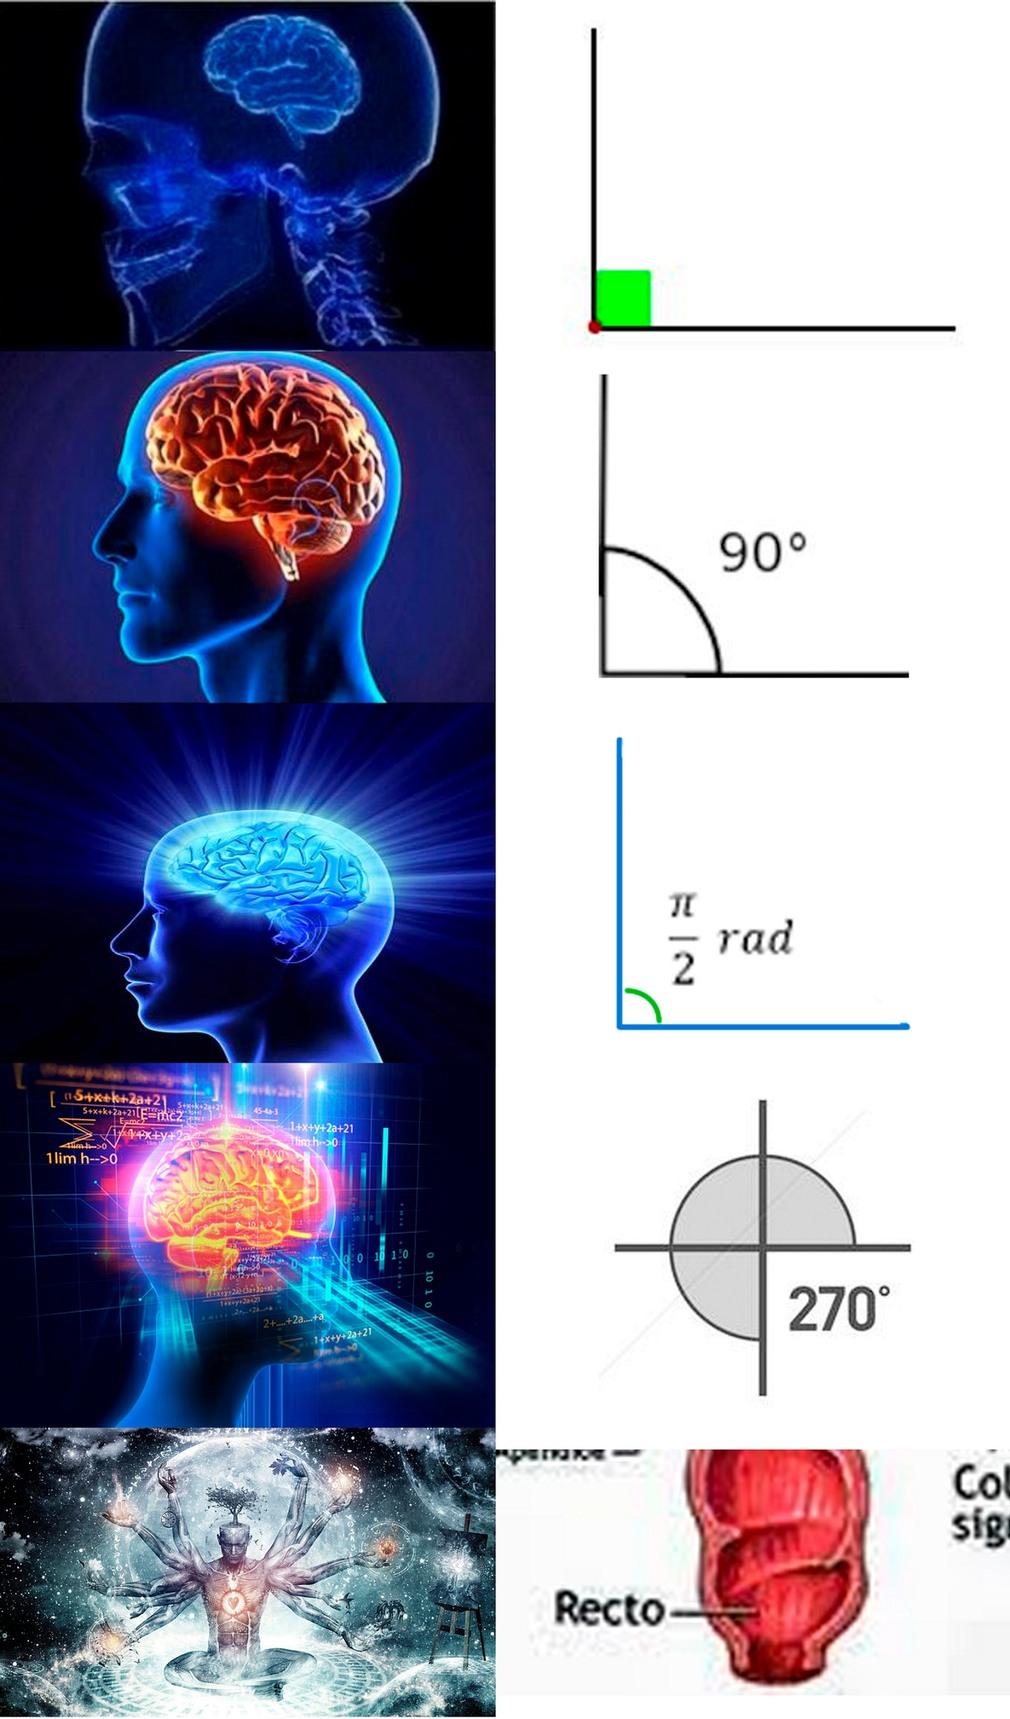 -180/2 - meme